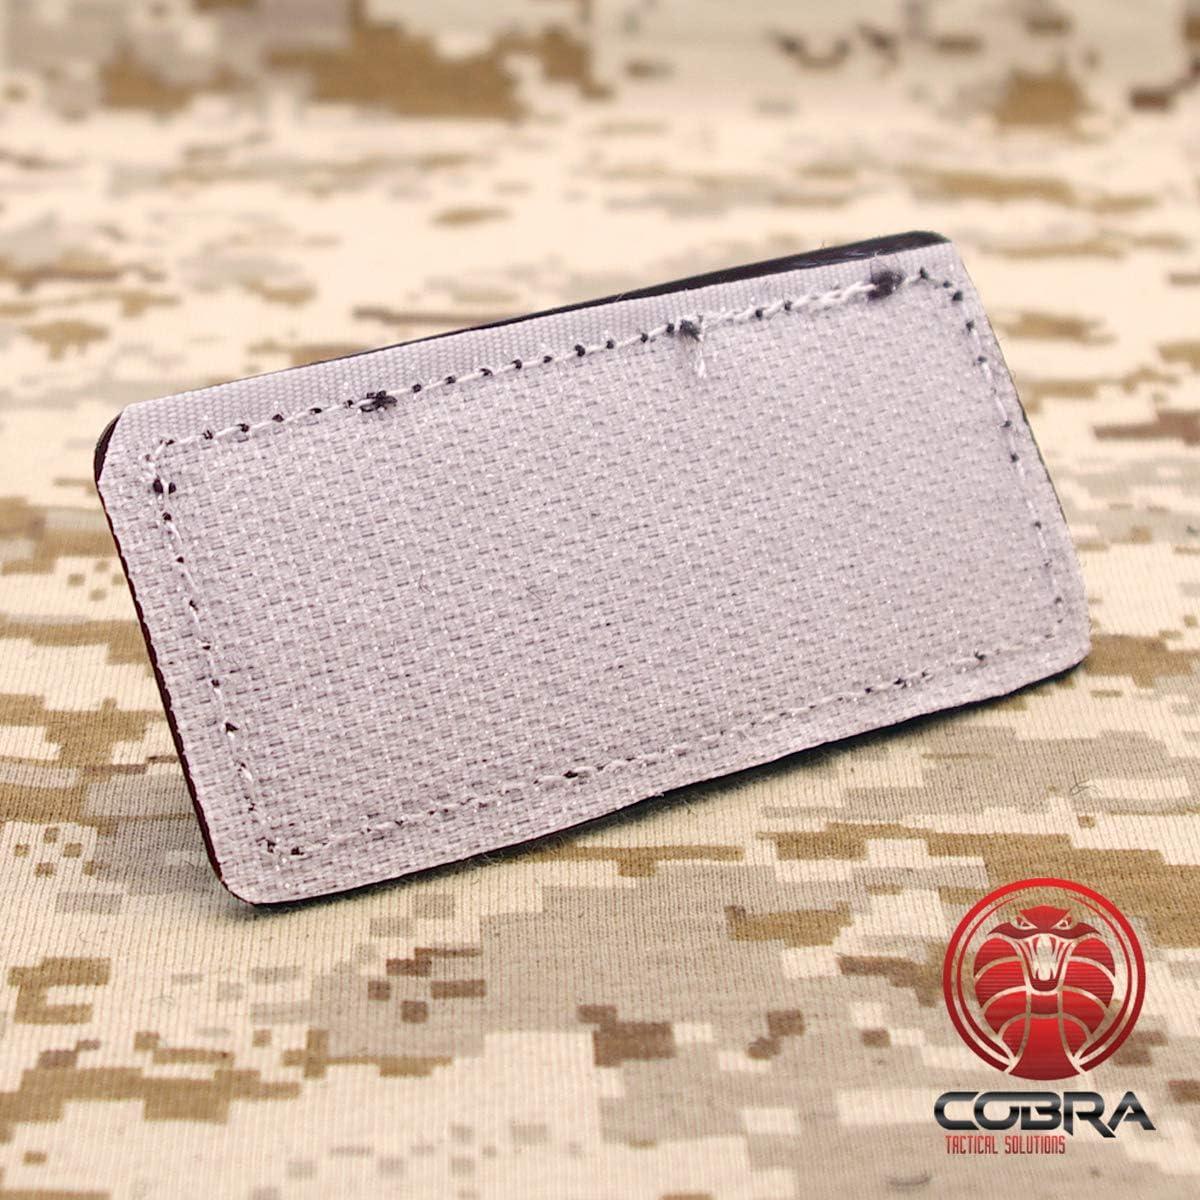 Cobra Tactical Solutions Paintball PVC Patch Mama Says Im Special blanco con Cierre de Velcro para Airsoft Ropa t/áctica y Mochila